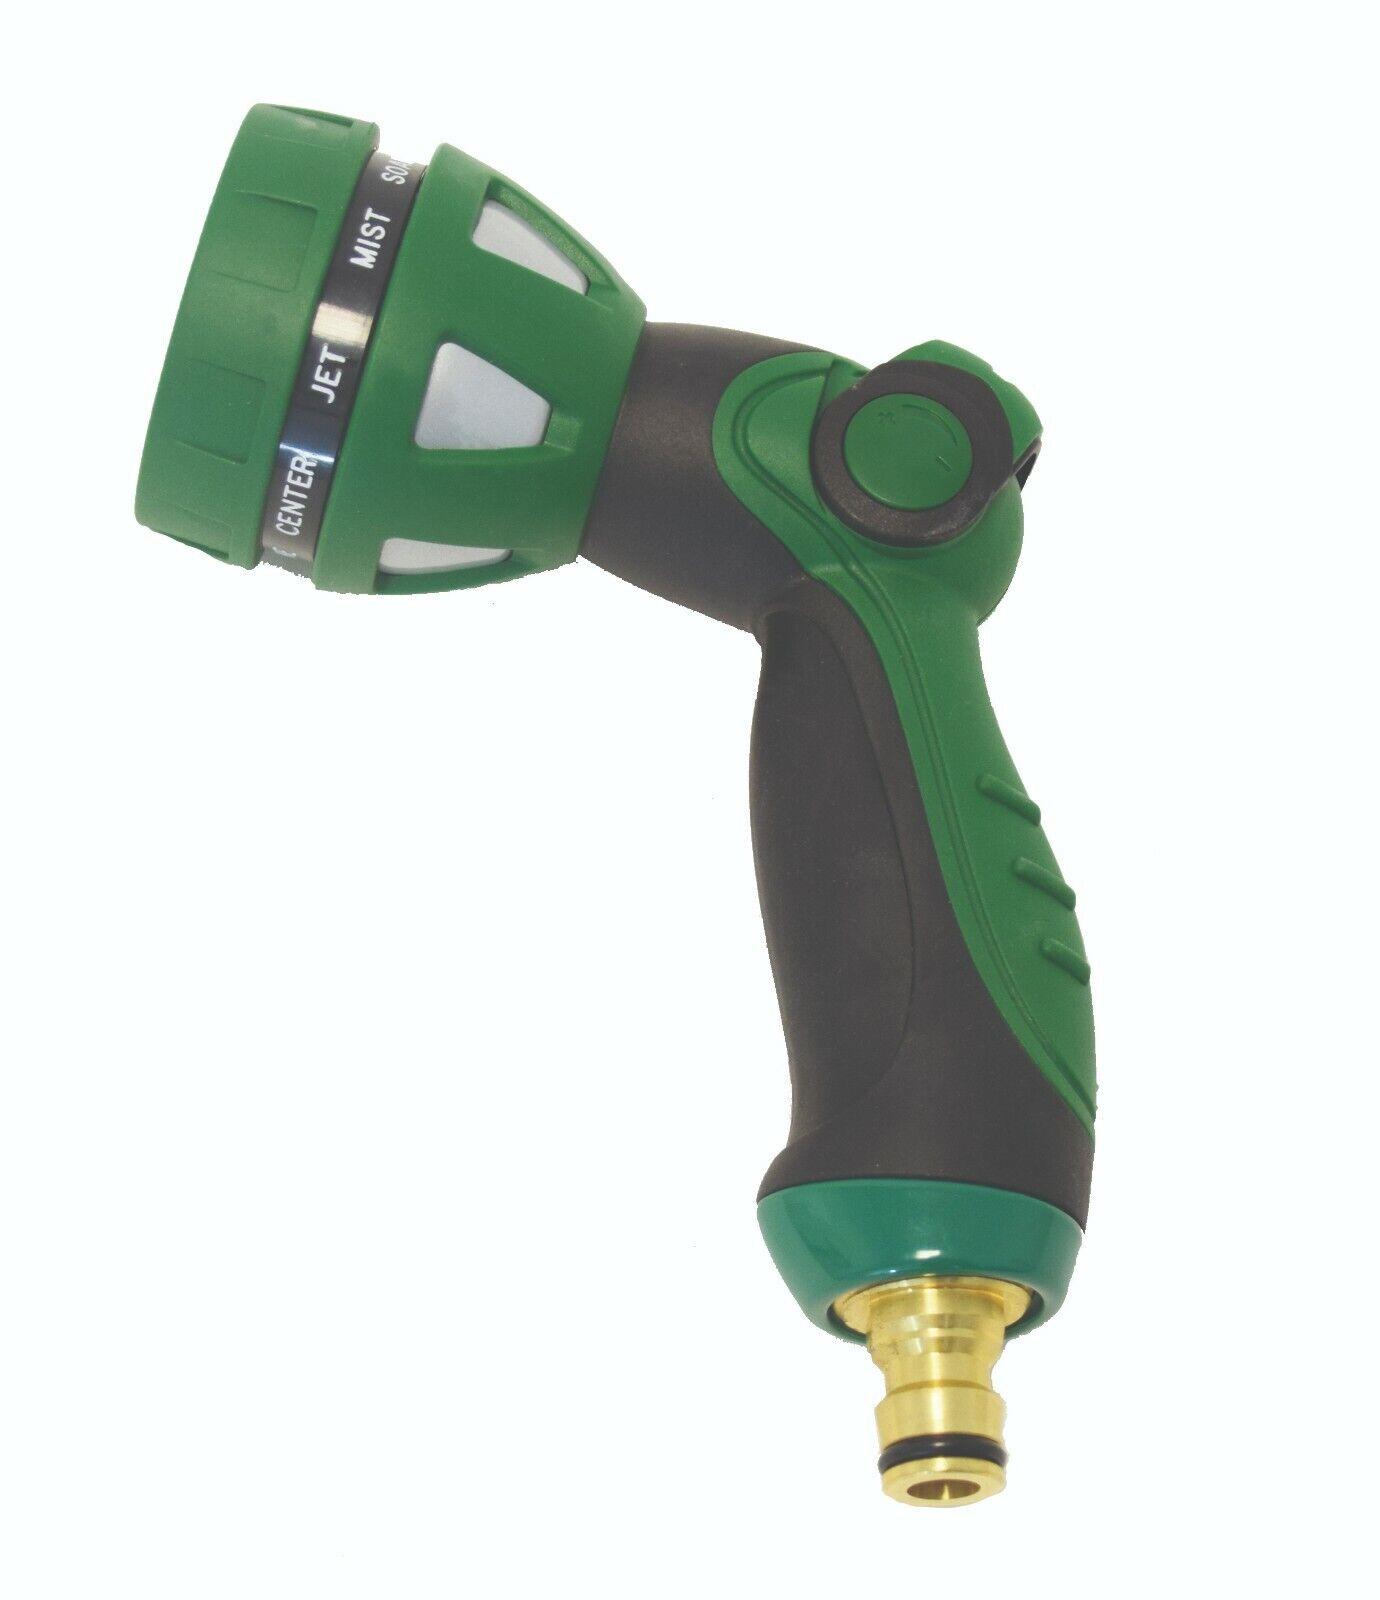 Spear & Jackson Kew Gardens Collection Multi Function Spray Gun-Green